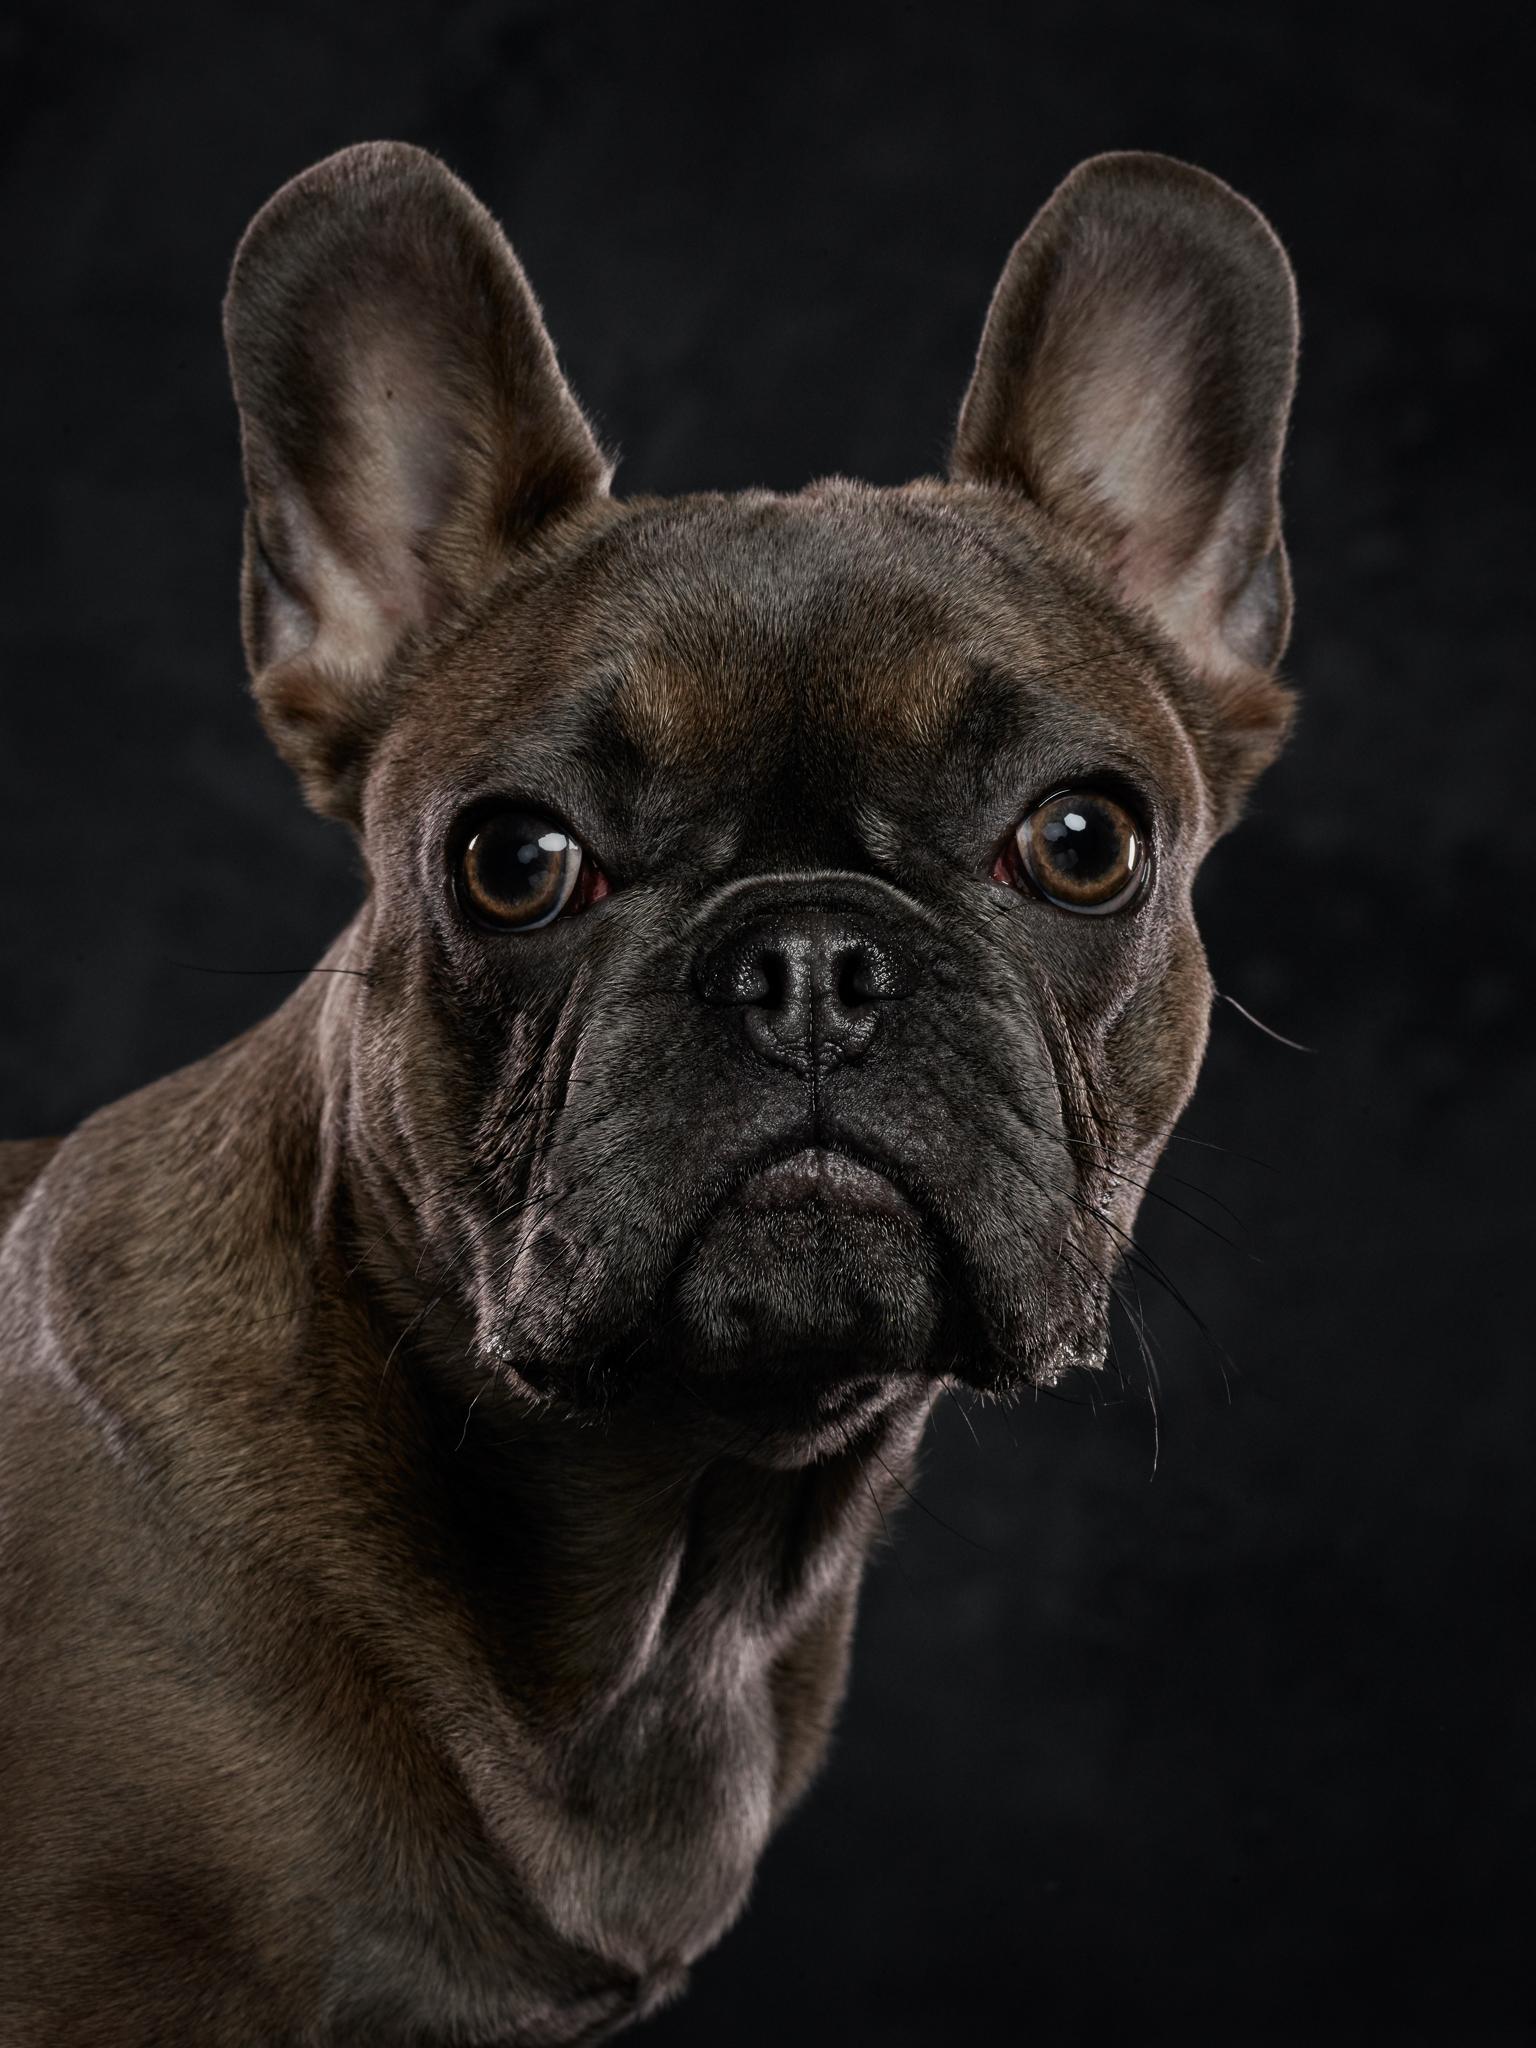 dog-photography-klaus-dyba-5.jpg